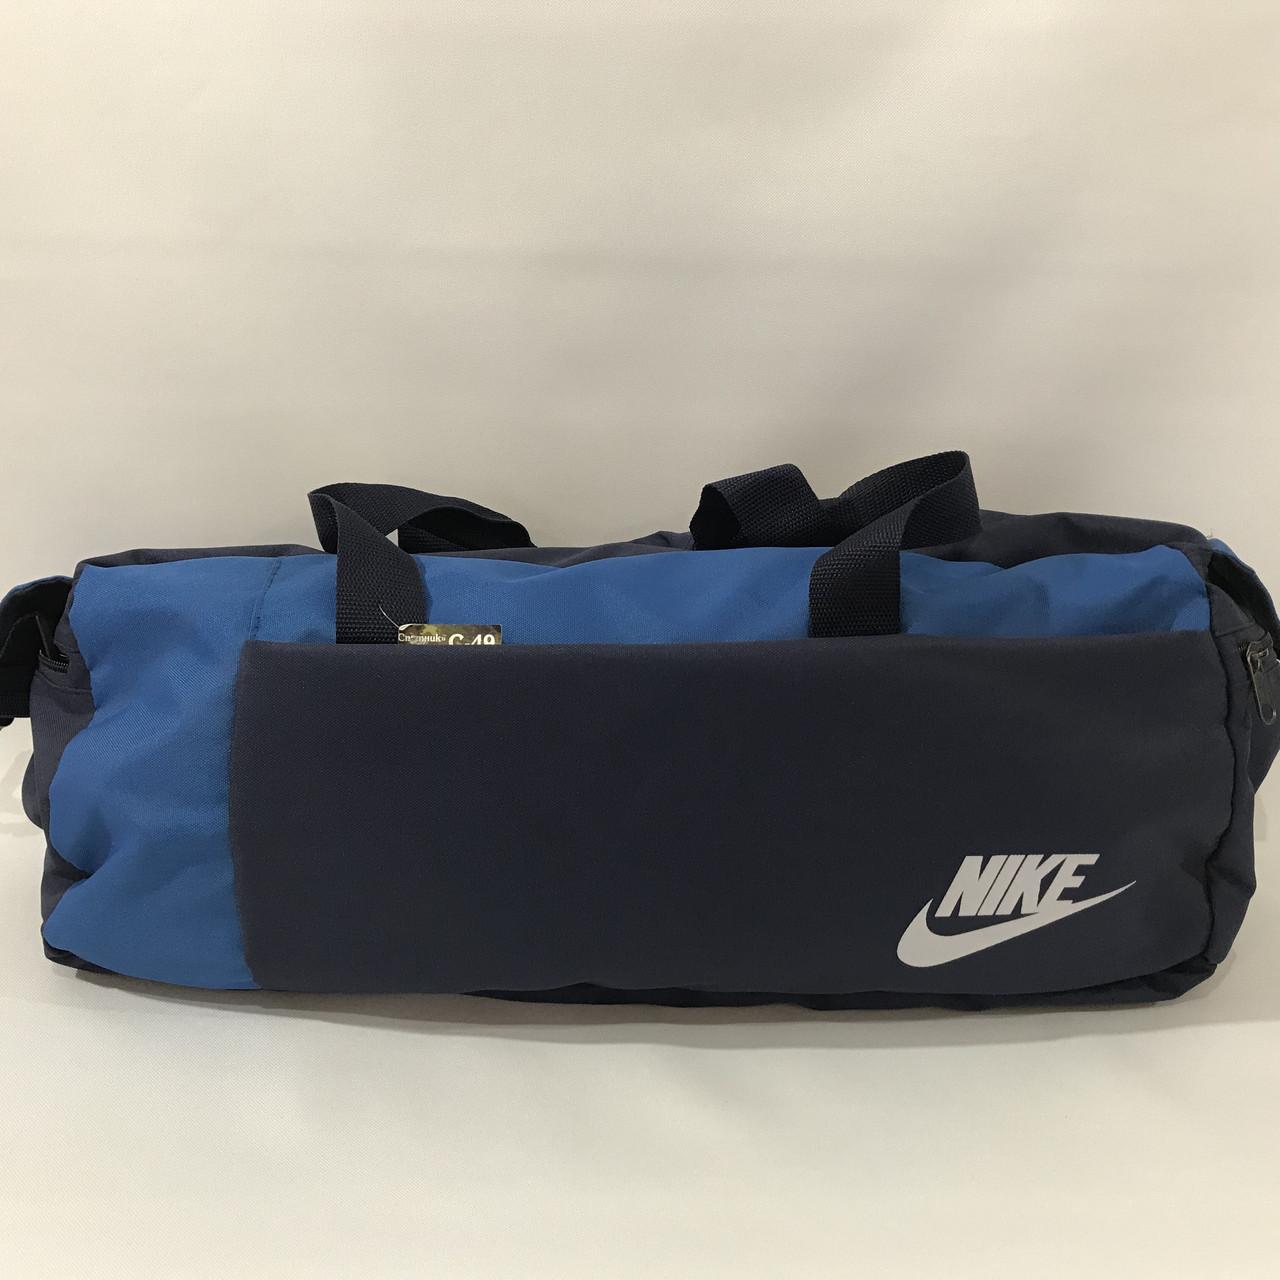 Спортивная дорожная сумка Nike / синяя